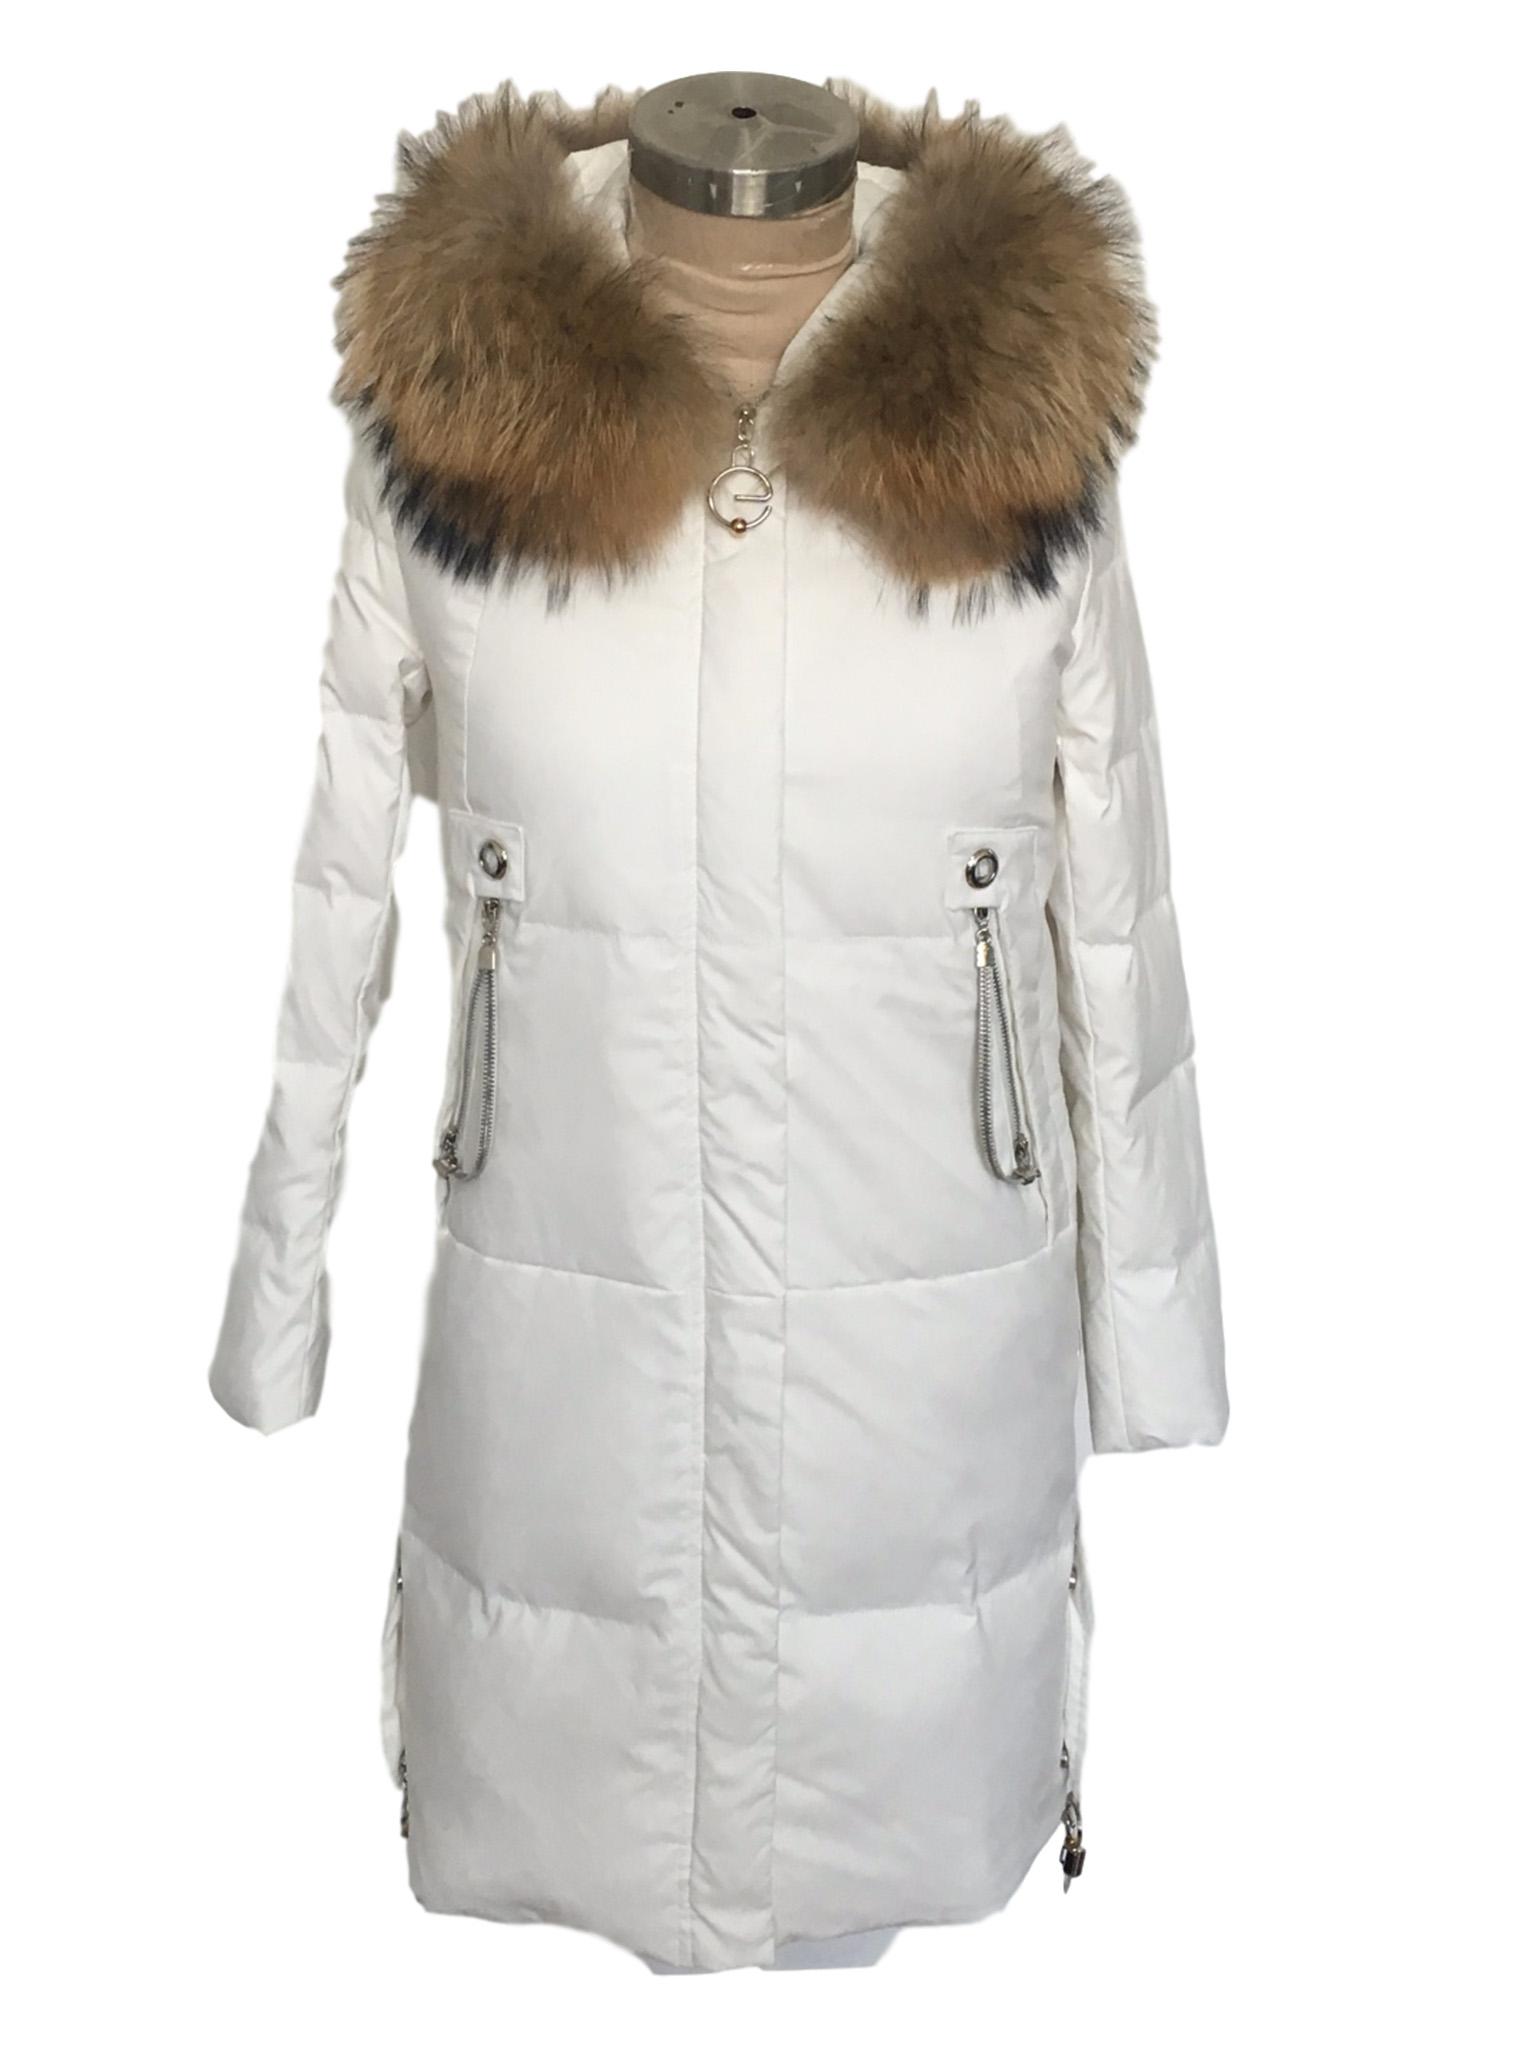 down jacket women,mens down jacket,down coat women